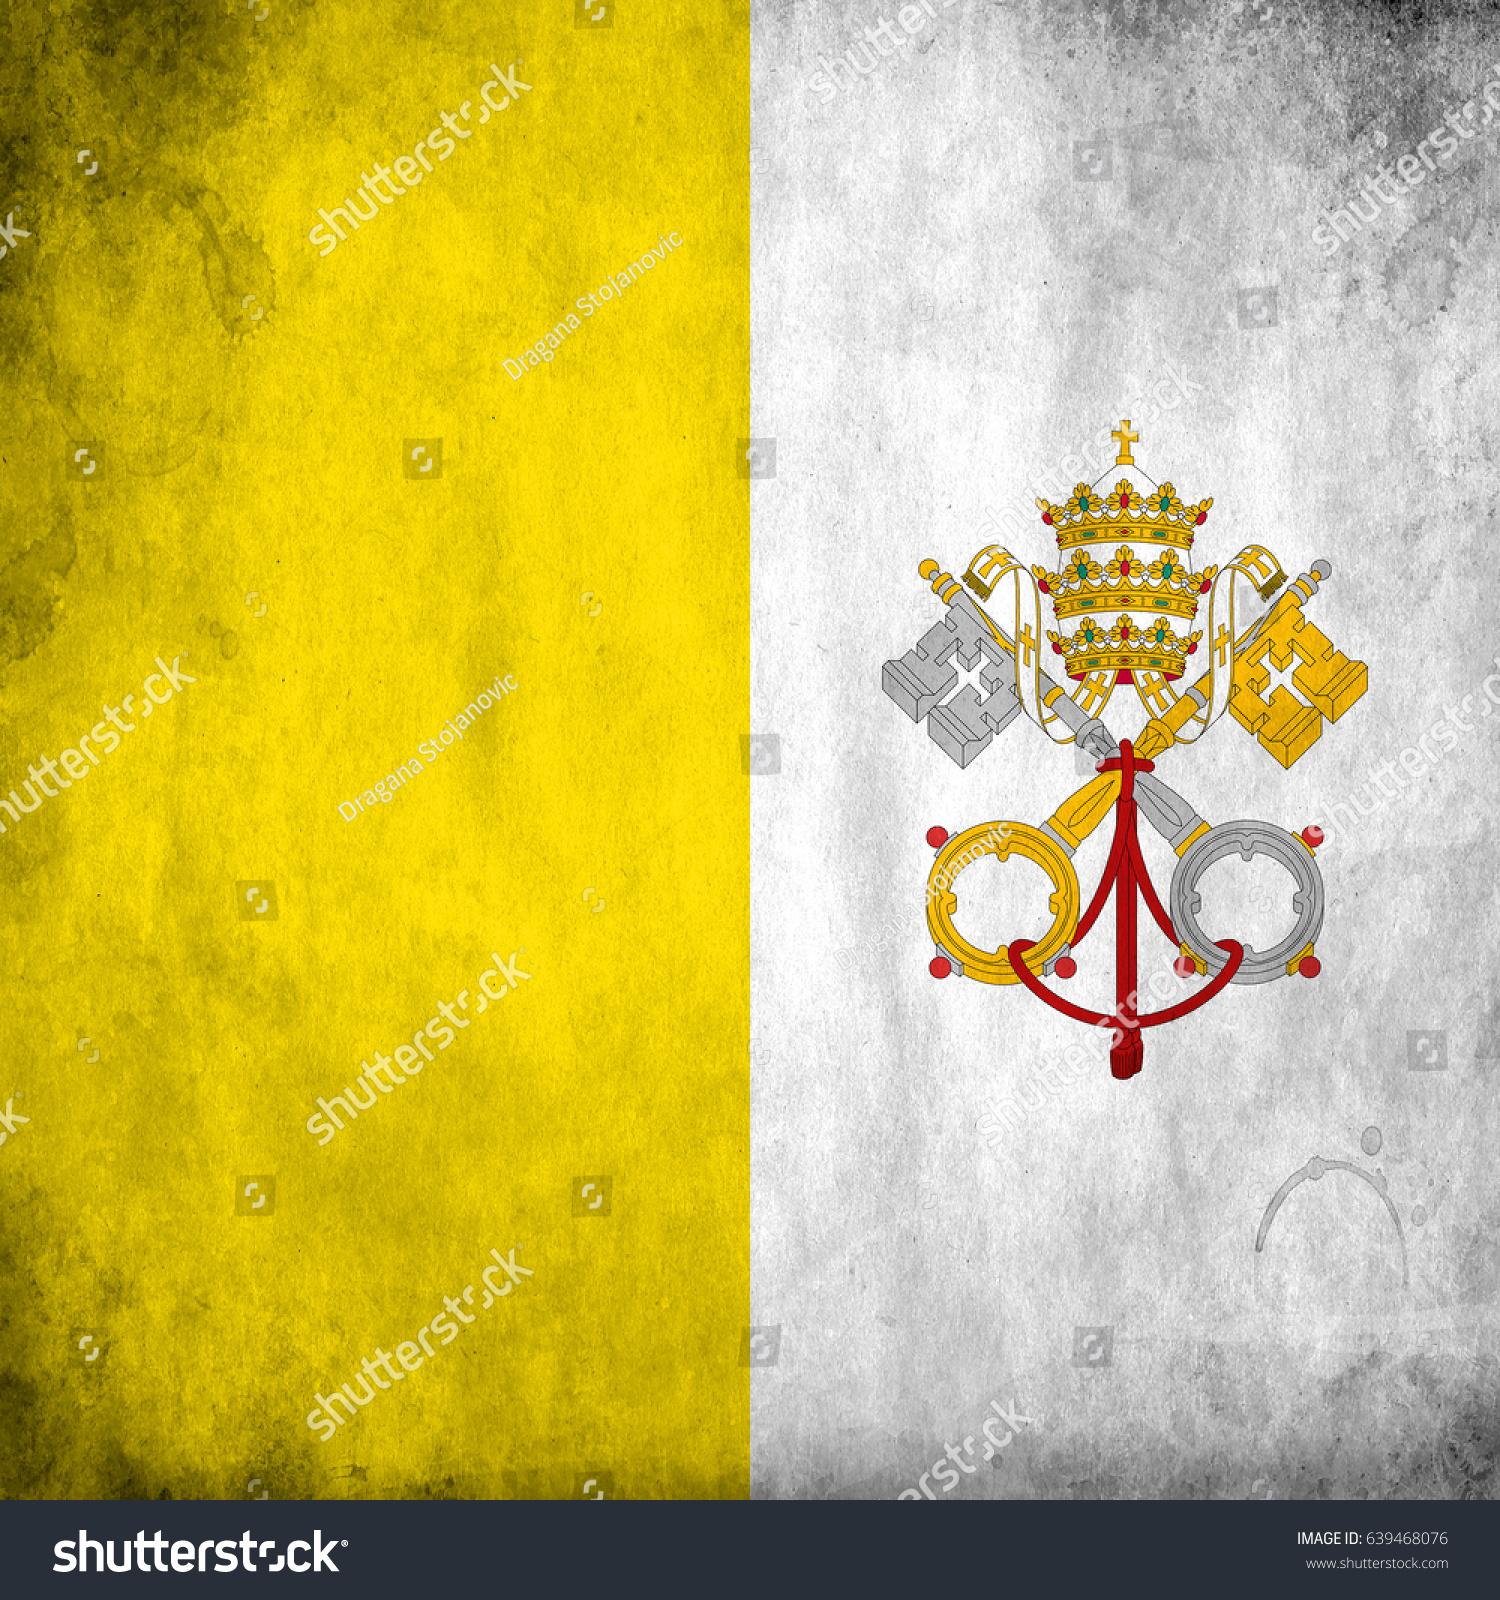 Vatican grunge flag photo